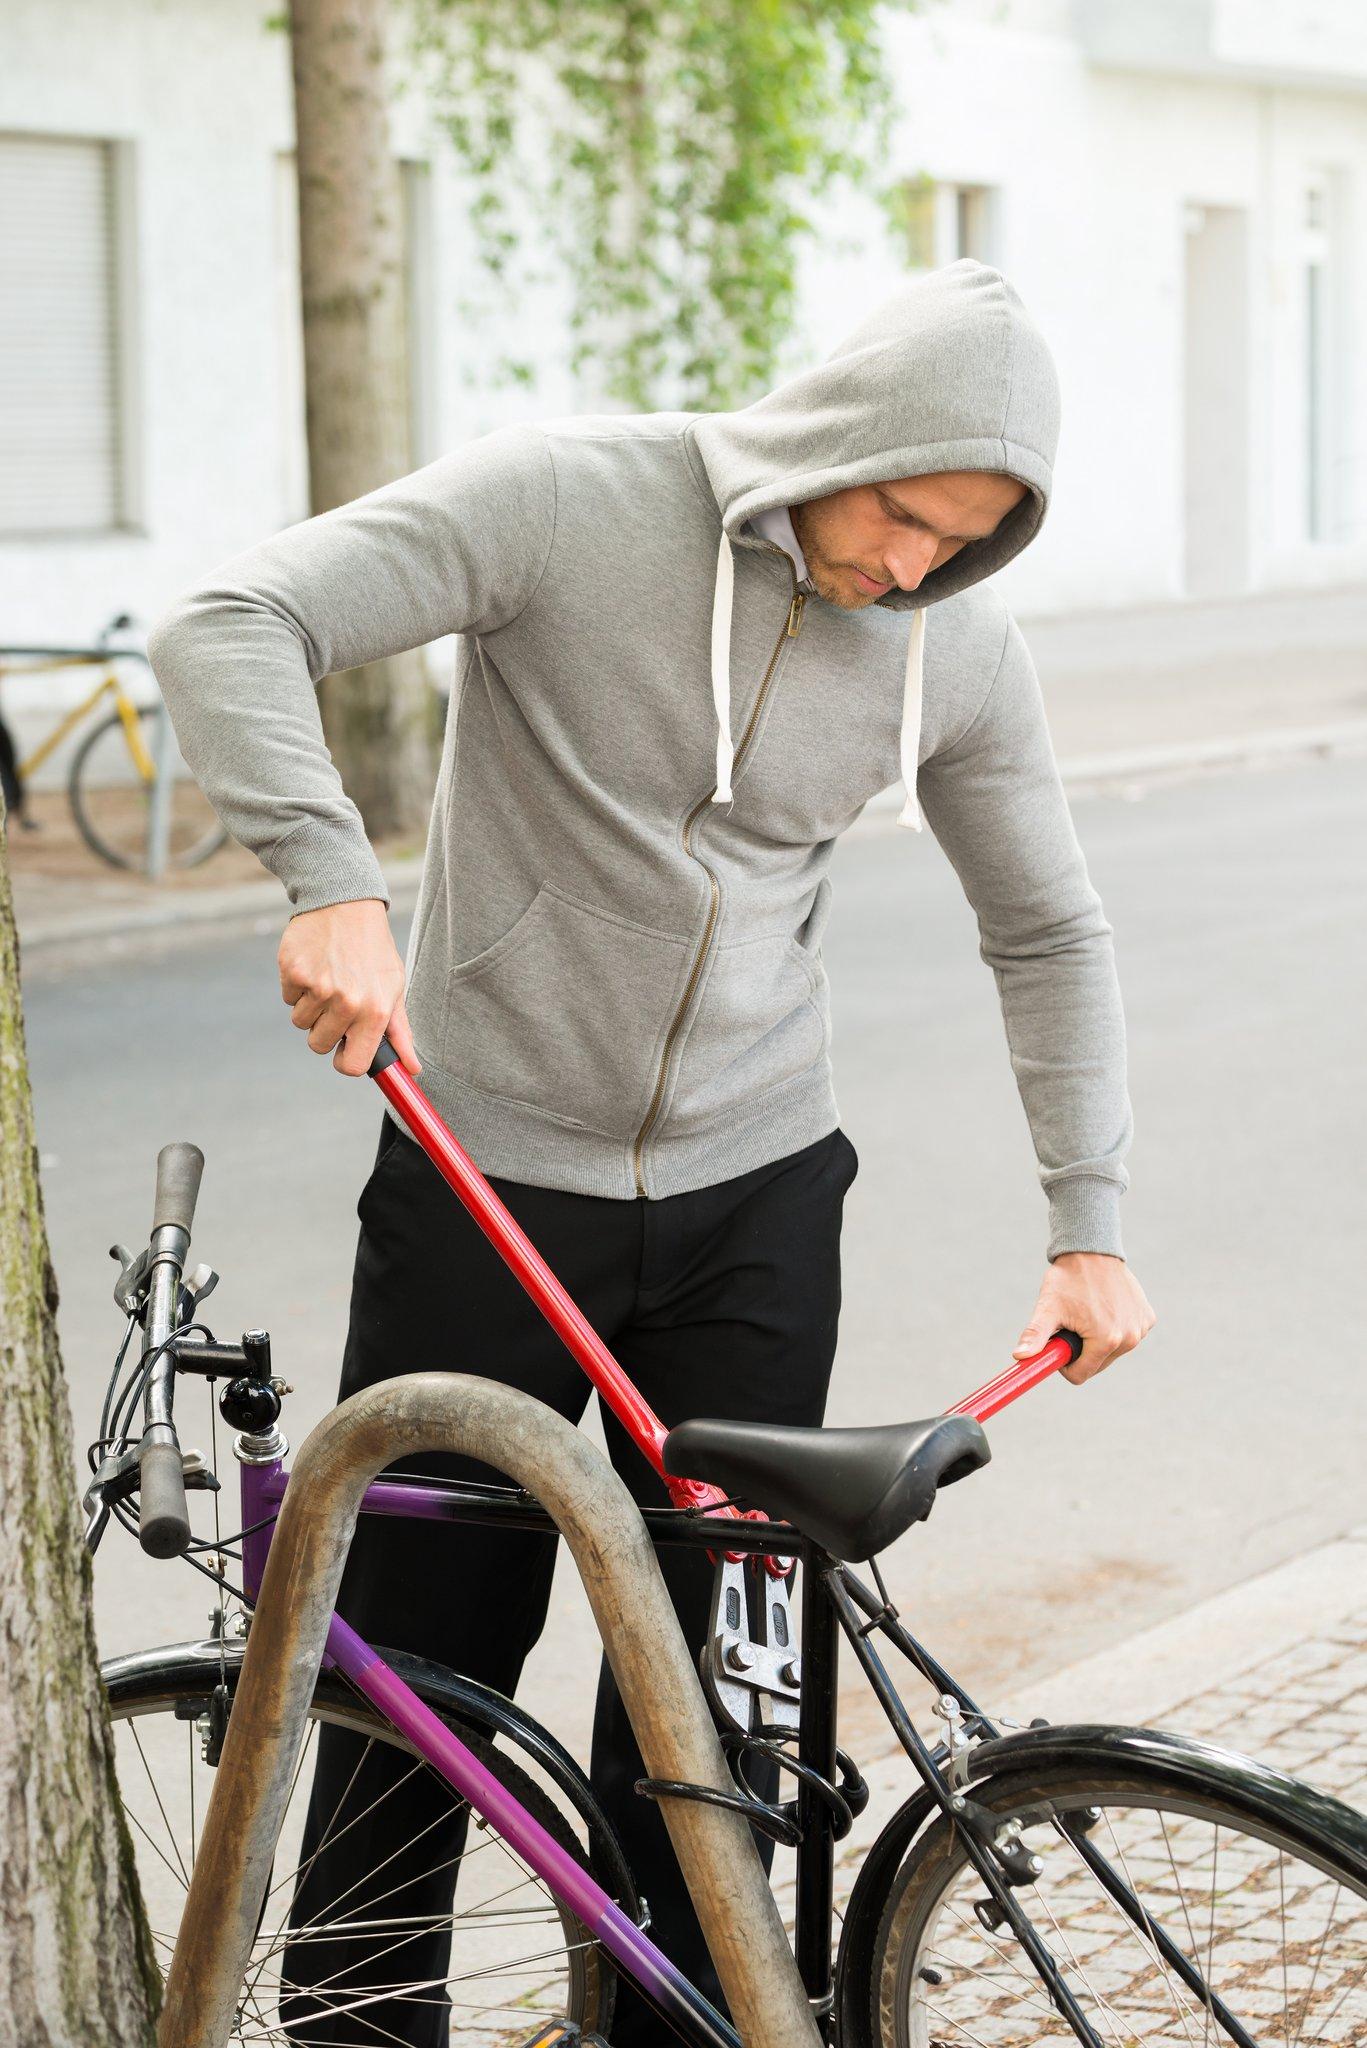 Alarmschloss in Fahrrad Schlösser & Sicherheit günstig